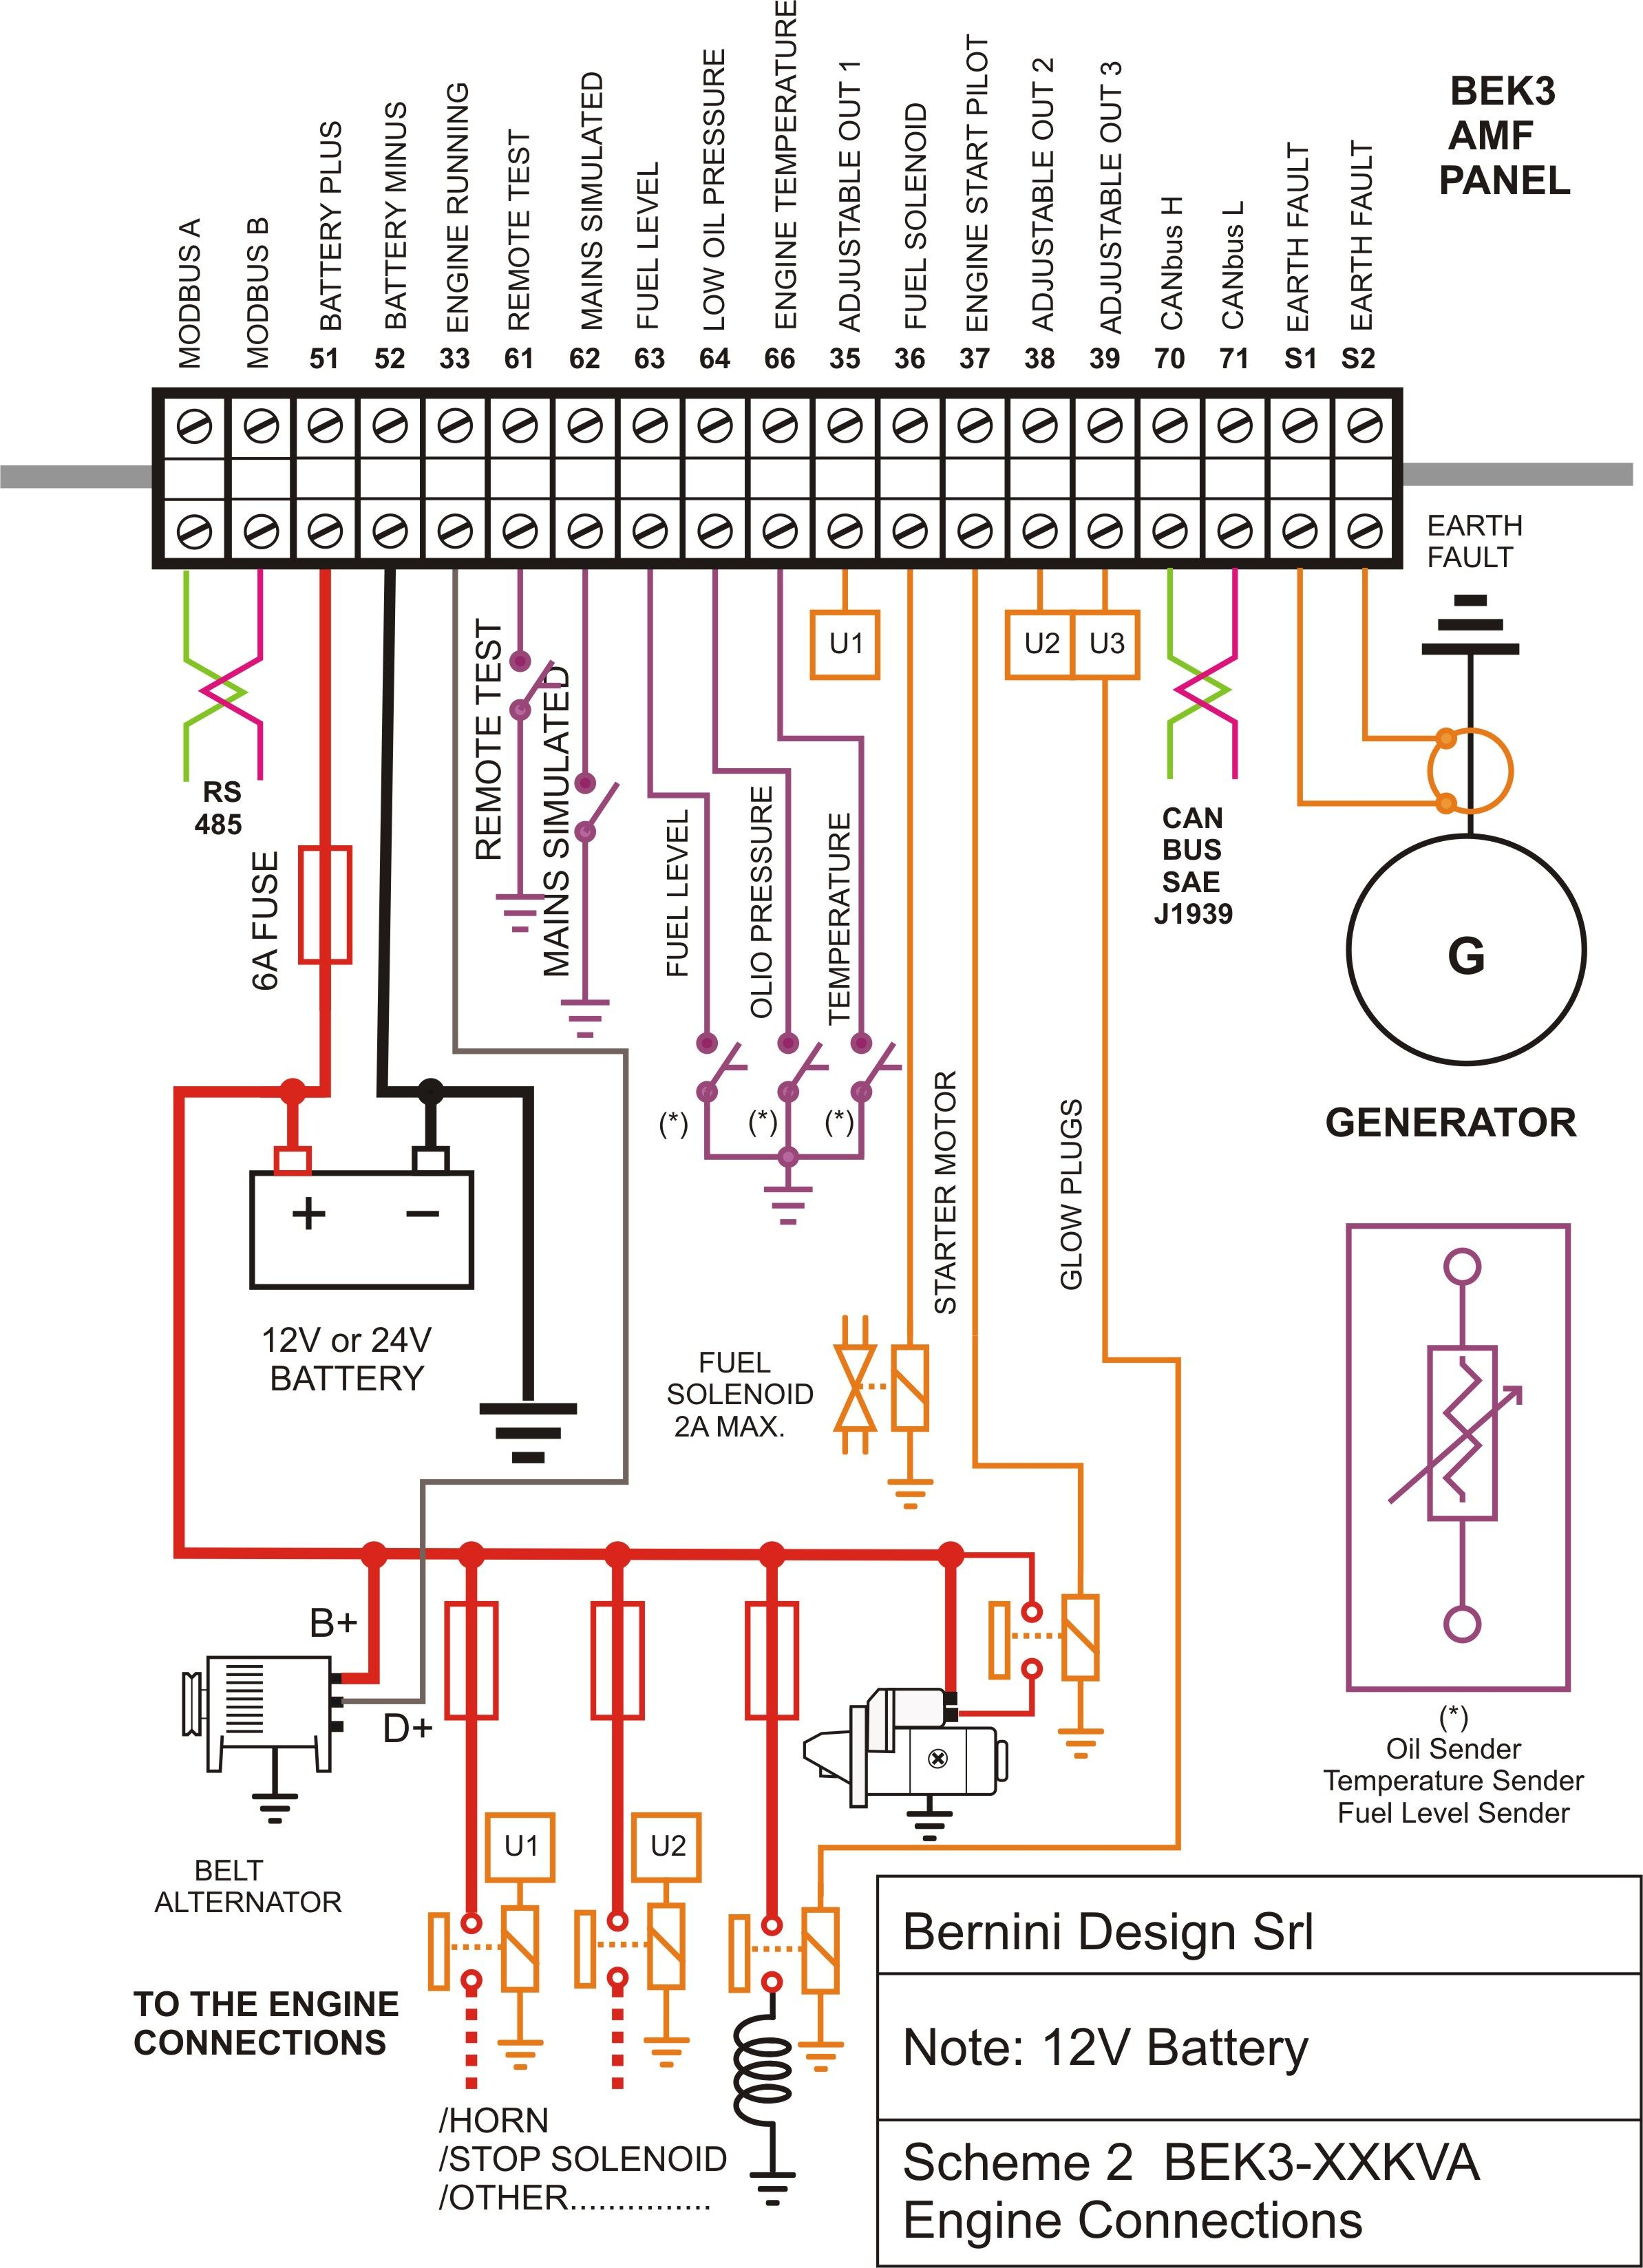 Diesel Generator Control Panel Wiring Diagram Engine Connections - Electrical Panel Wiring Diagram